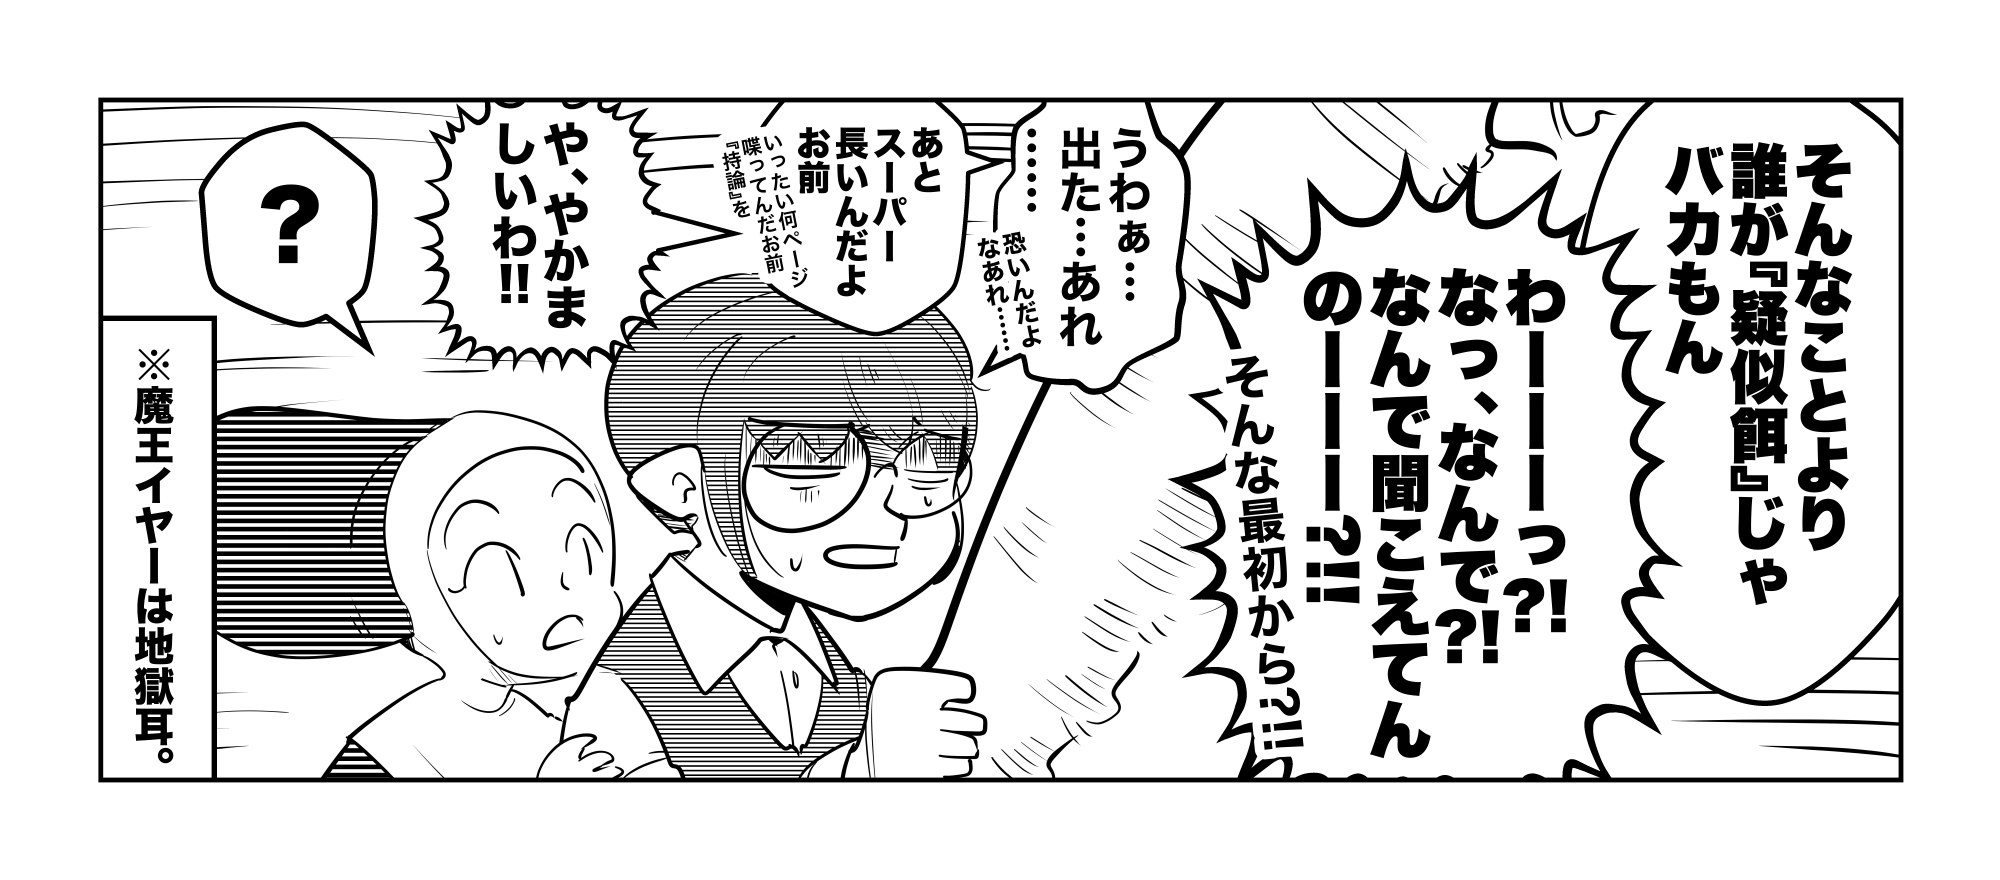 f:id:terashimaru117:20210914221214p:plain